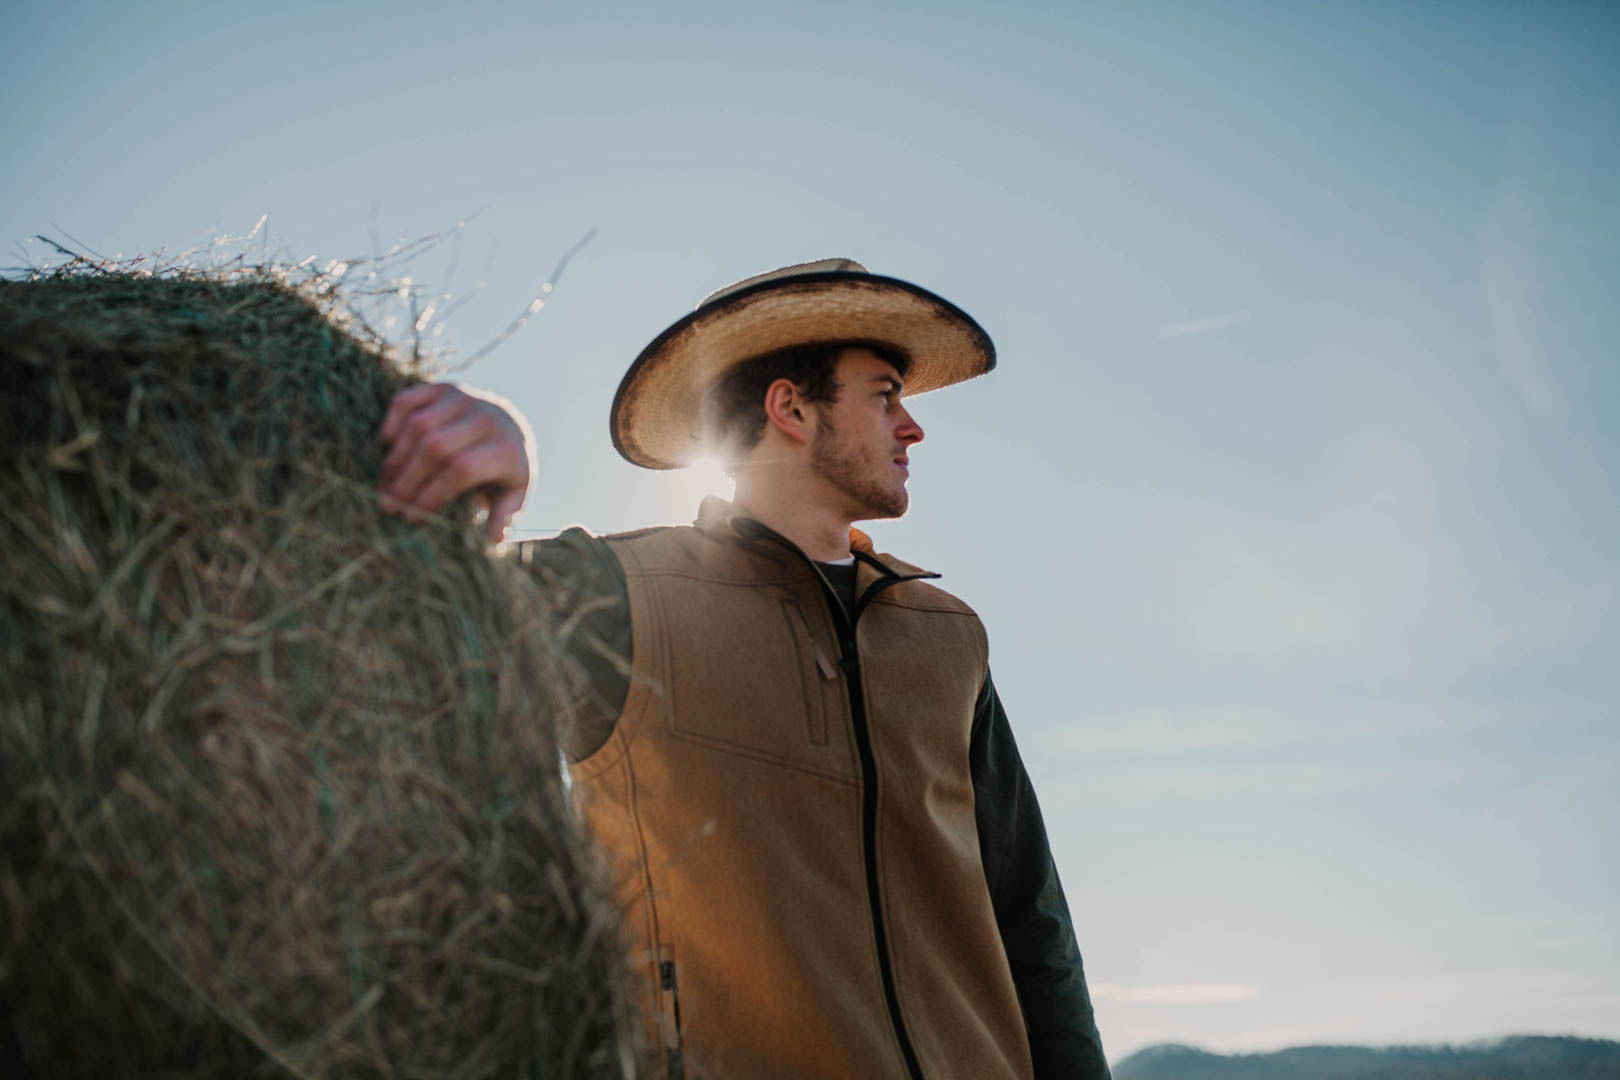 Cowboy Western Outerwear